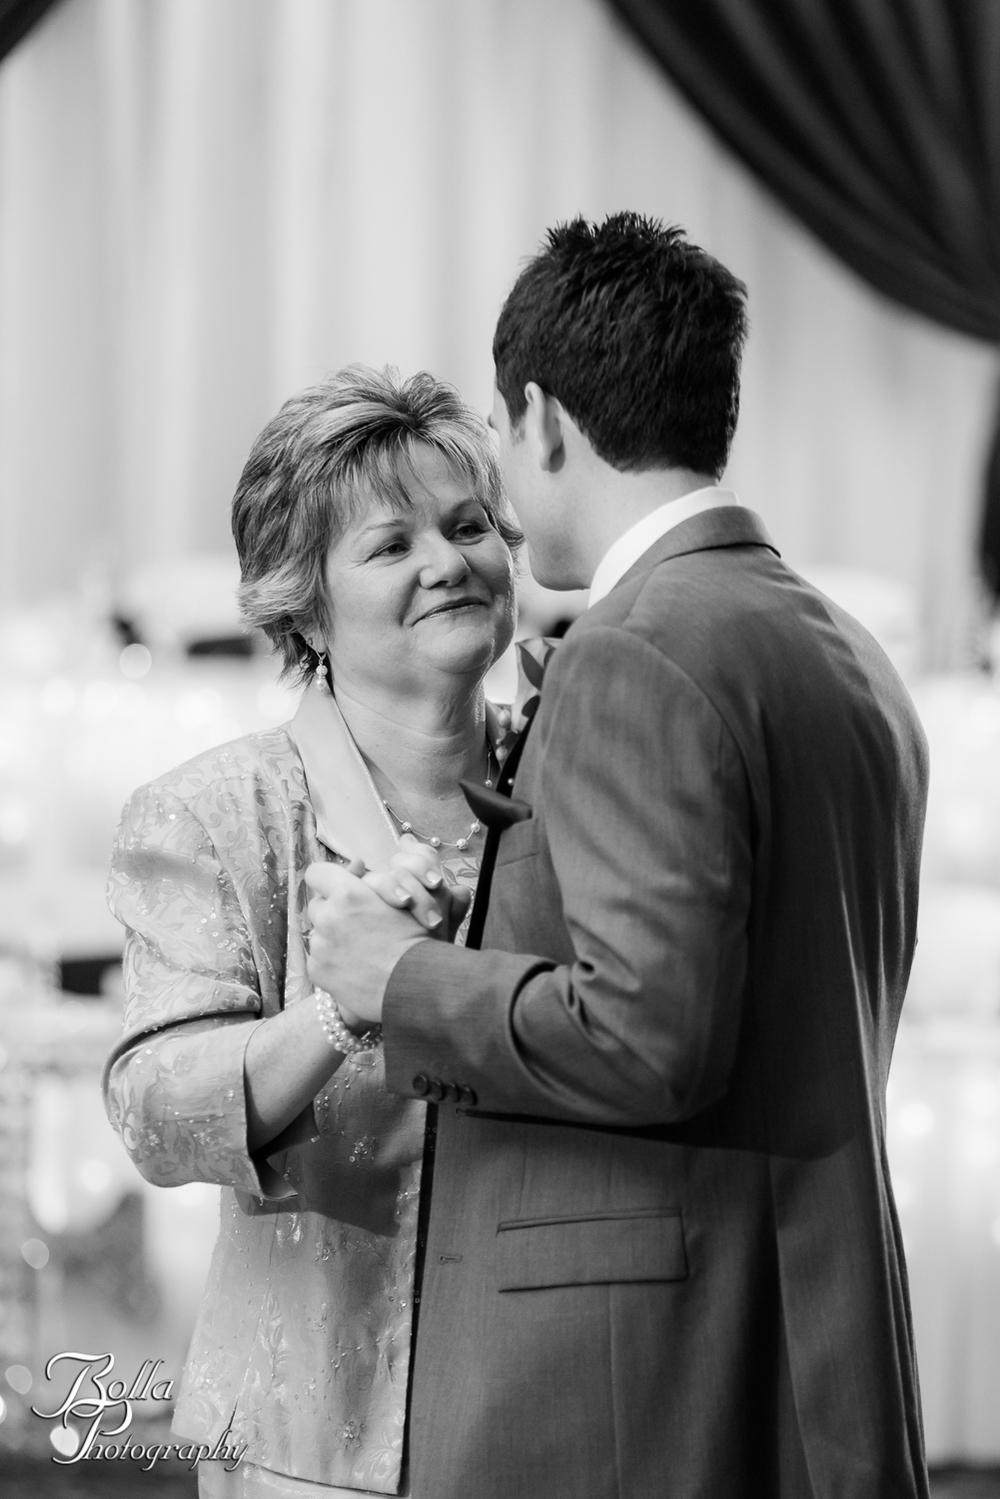 Bolla_Photography_St_Louis_wedding_photographer-0489.jpg